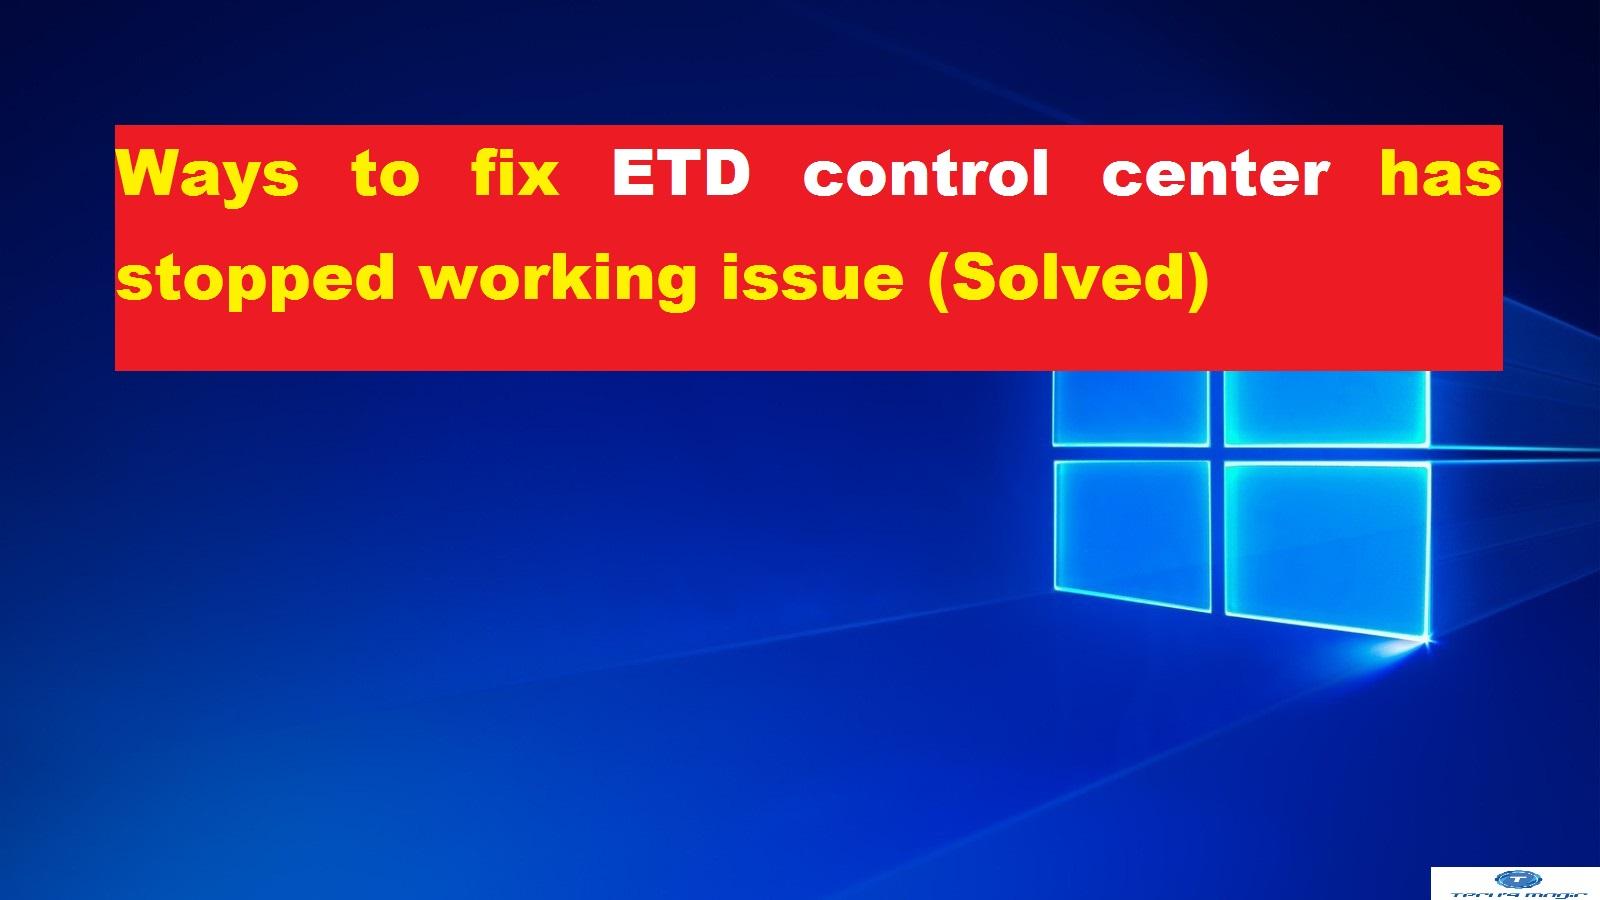 ETD control center not working